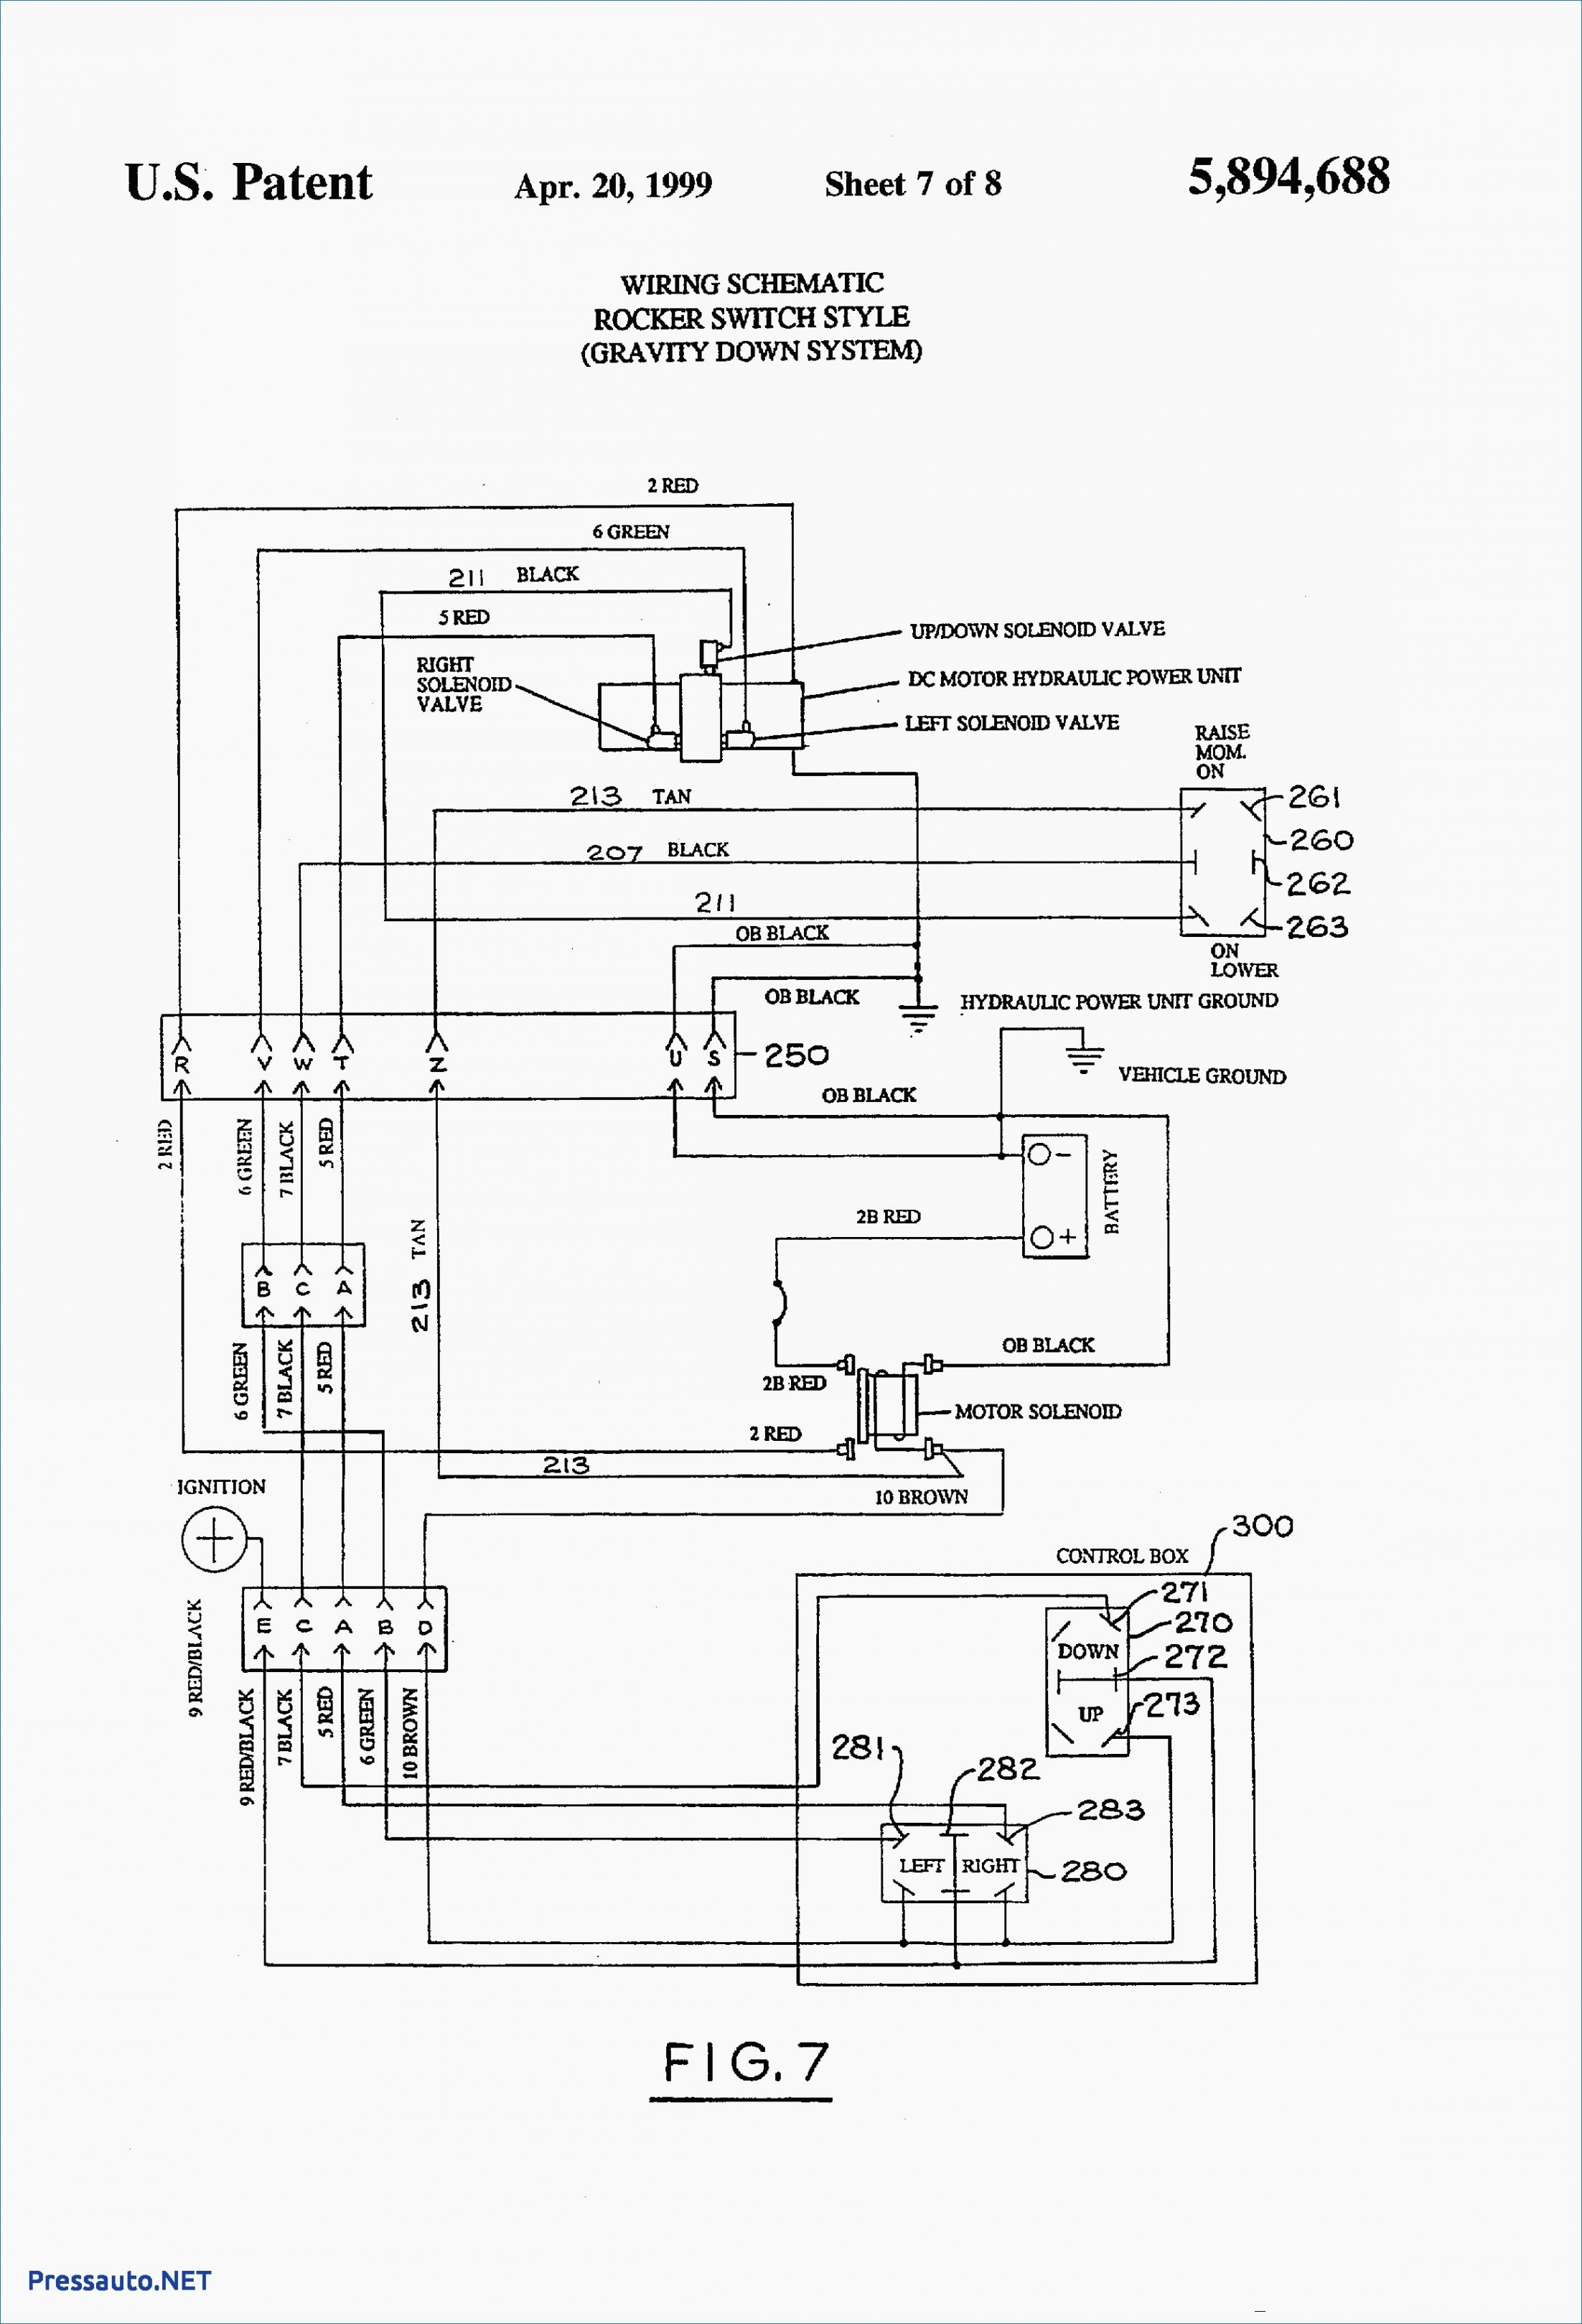 Meyer E47 Wiring Diagram : meyer, wiring, diagram, DIAGRAM], Fisher, Control, Wiring, Diagram, Version, Quality, LOGICDIAGRAM.MONTECRISTO2010.IT